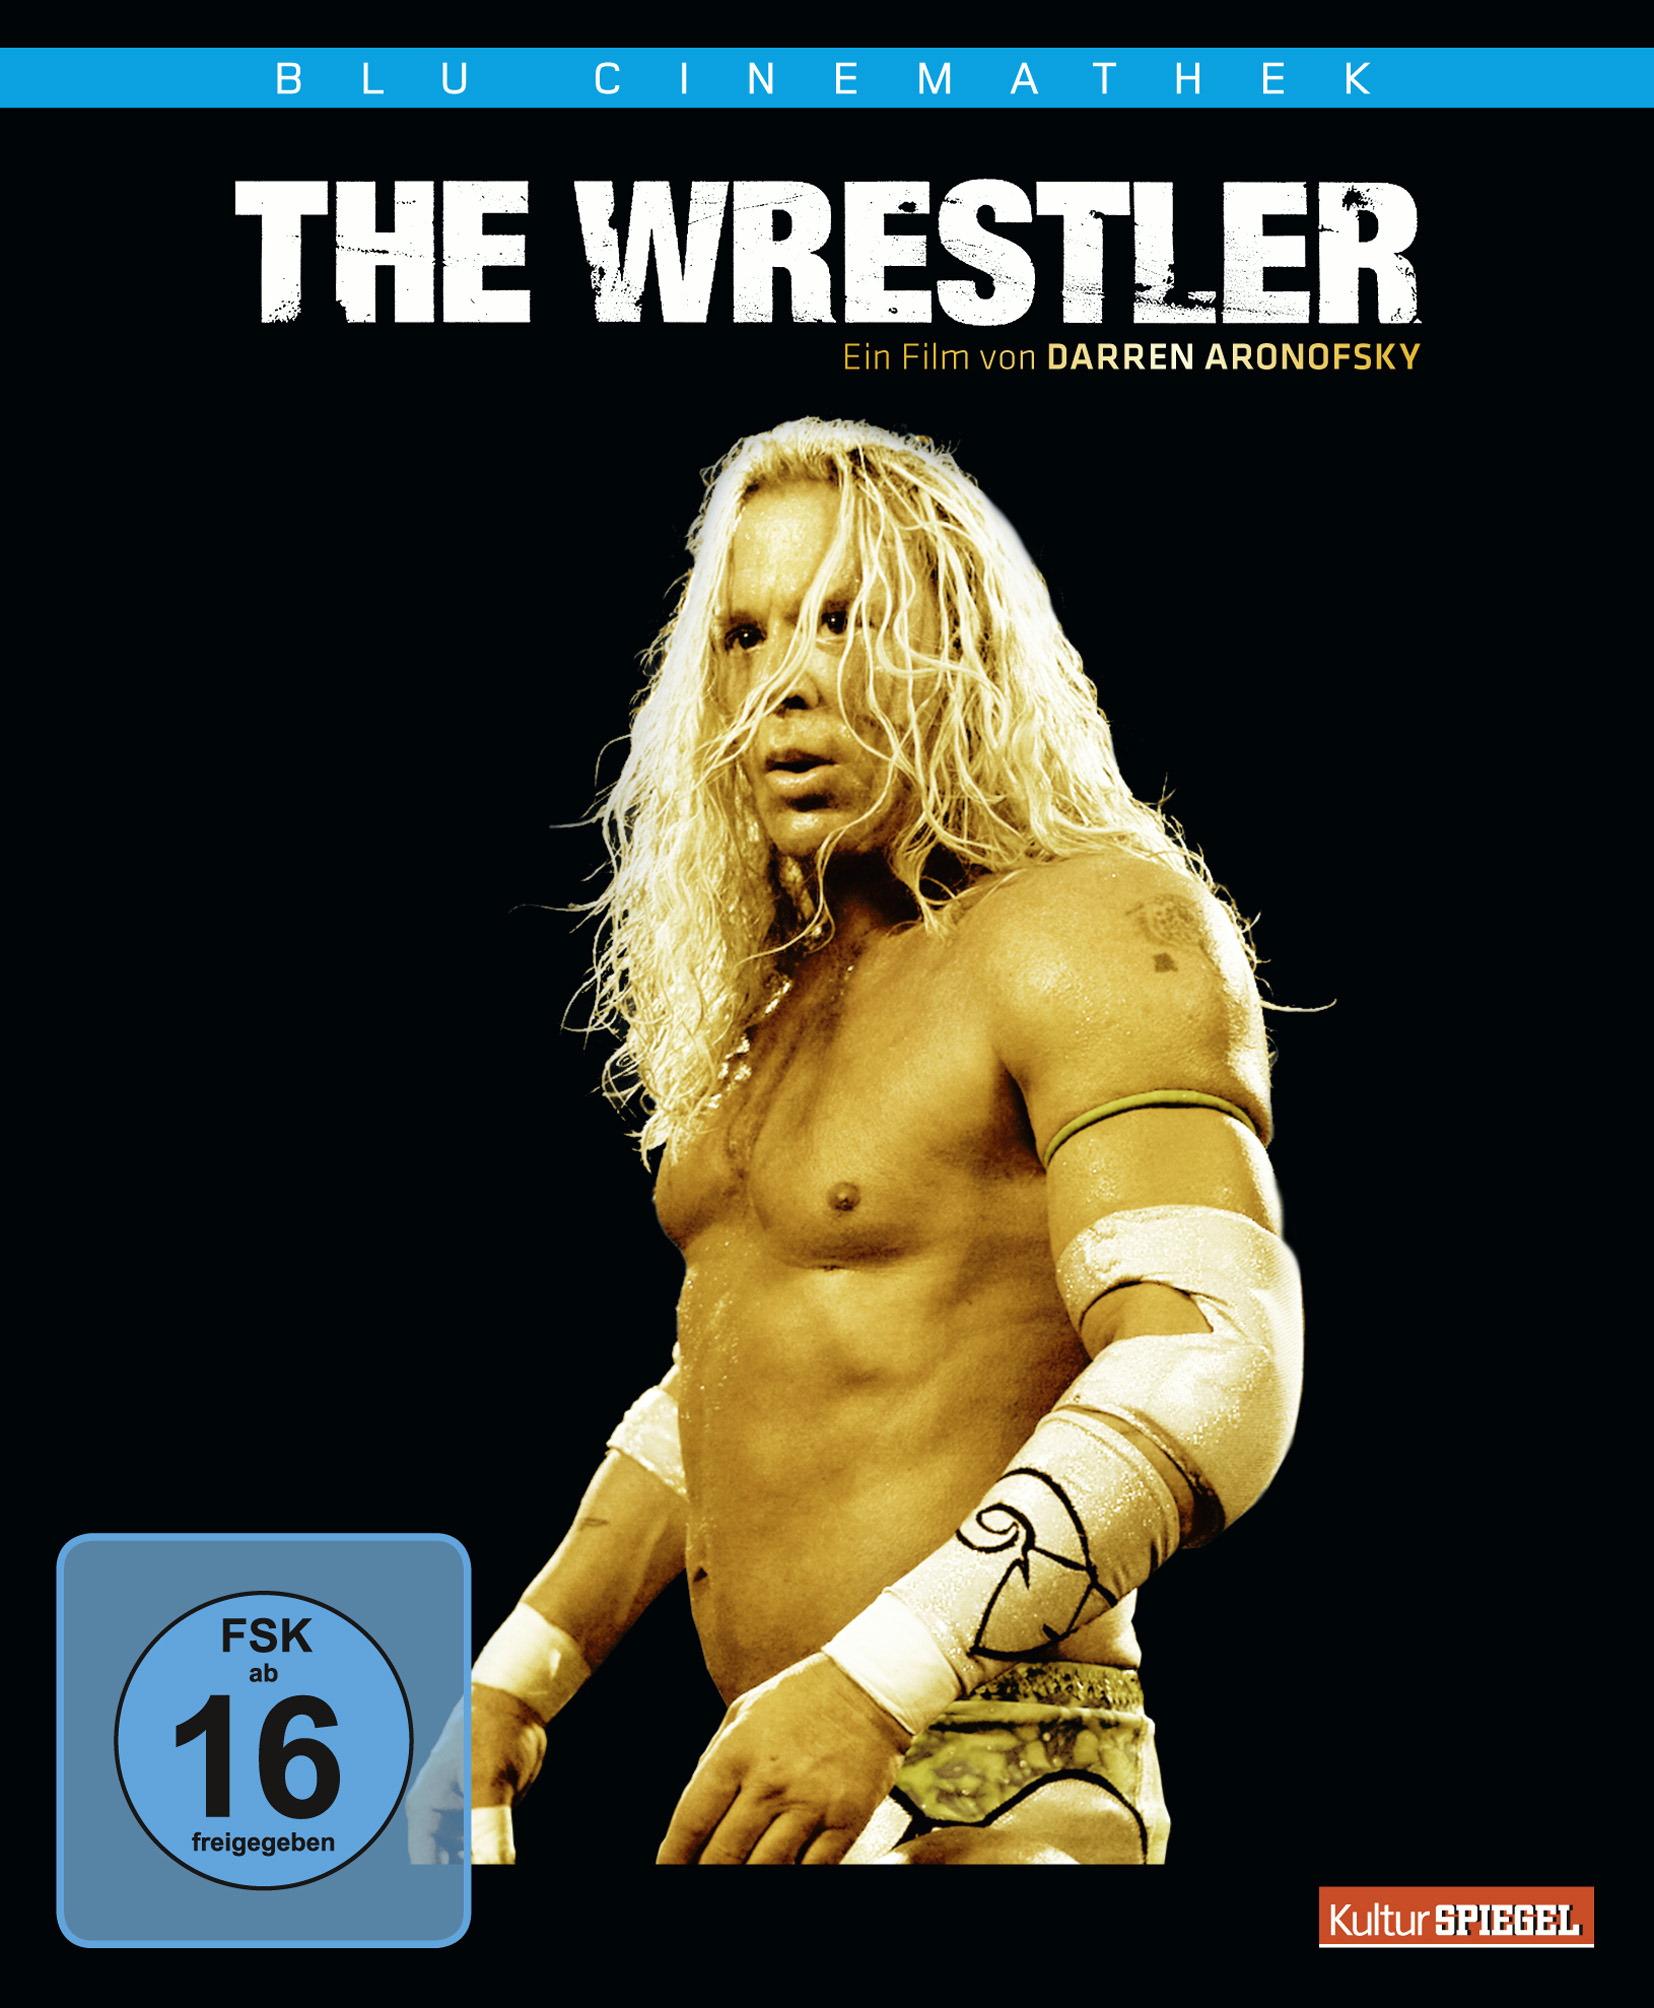 The Wrestler (Blu Cinemathek) Poster